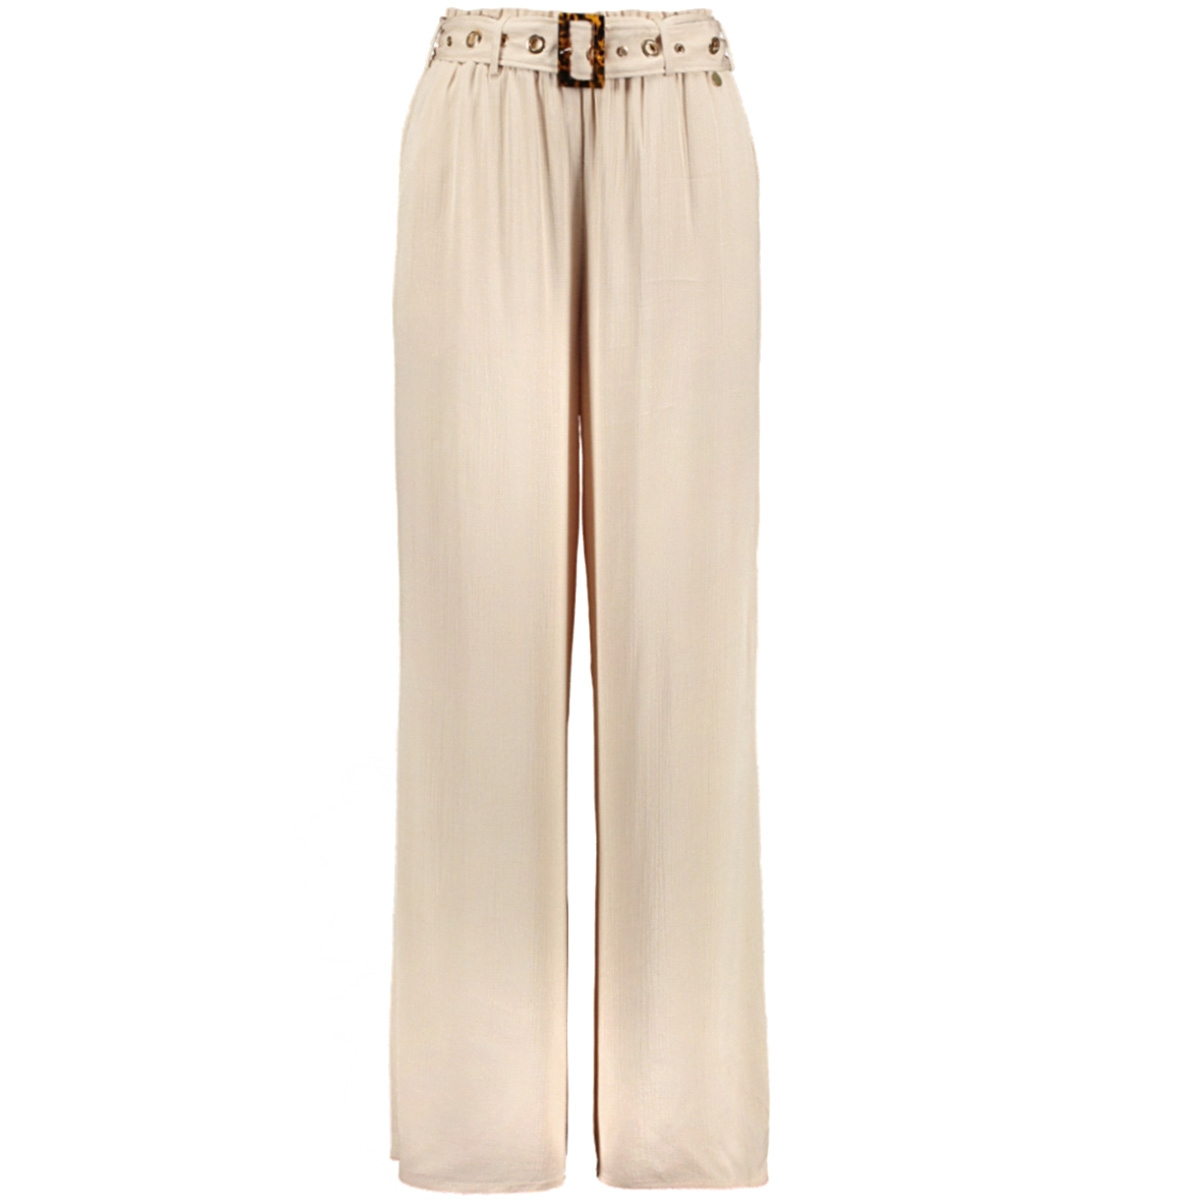 lynn pants ss20x104 harper & yve broek creme